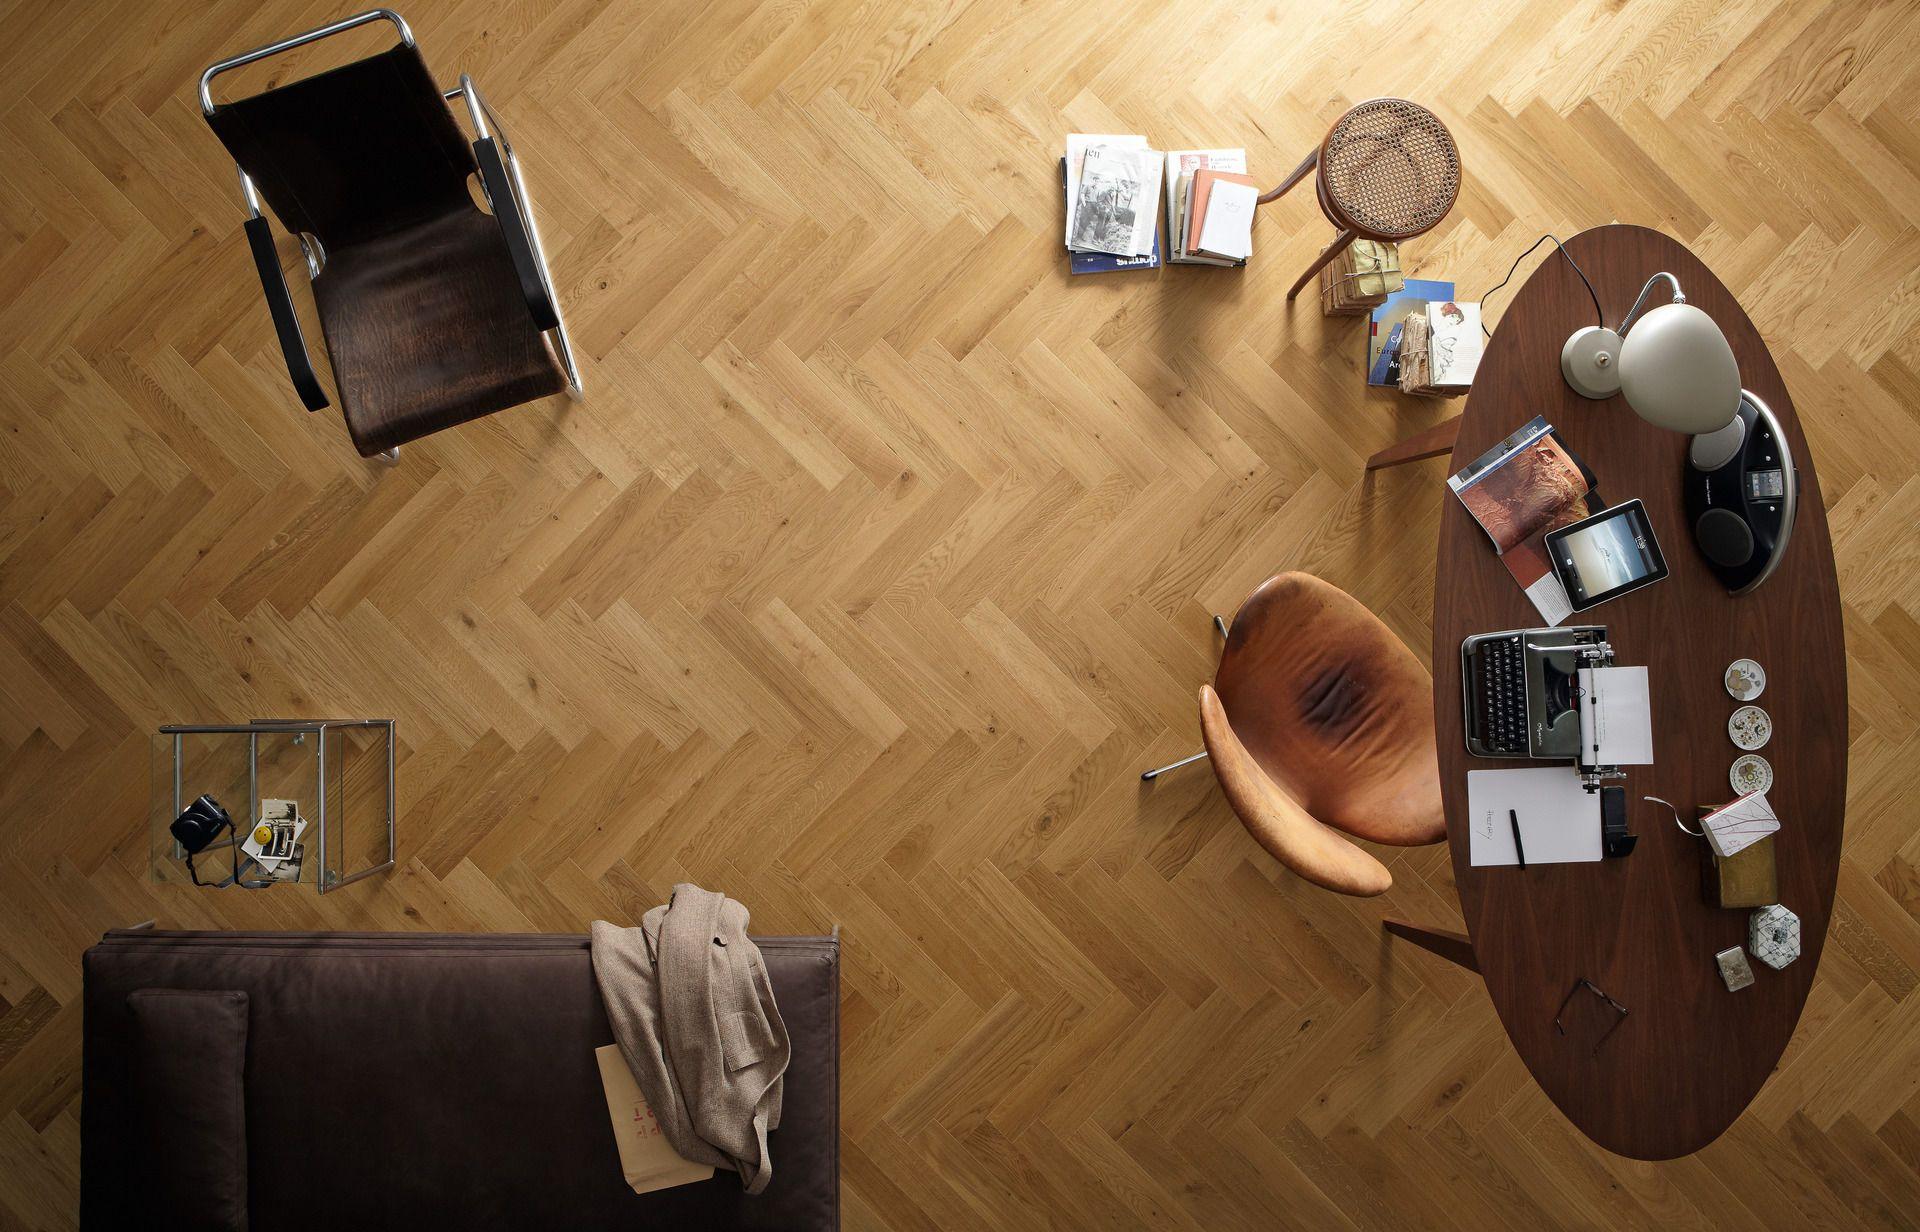 Berühmt Holzböden renovieren - bauemotion.de JZ79